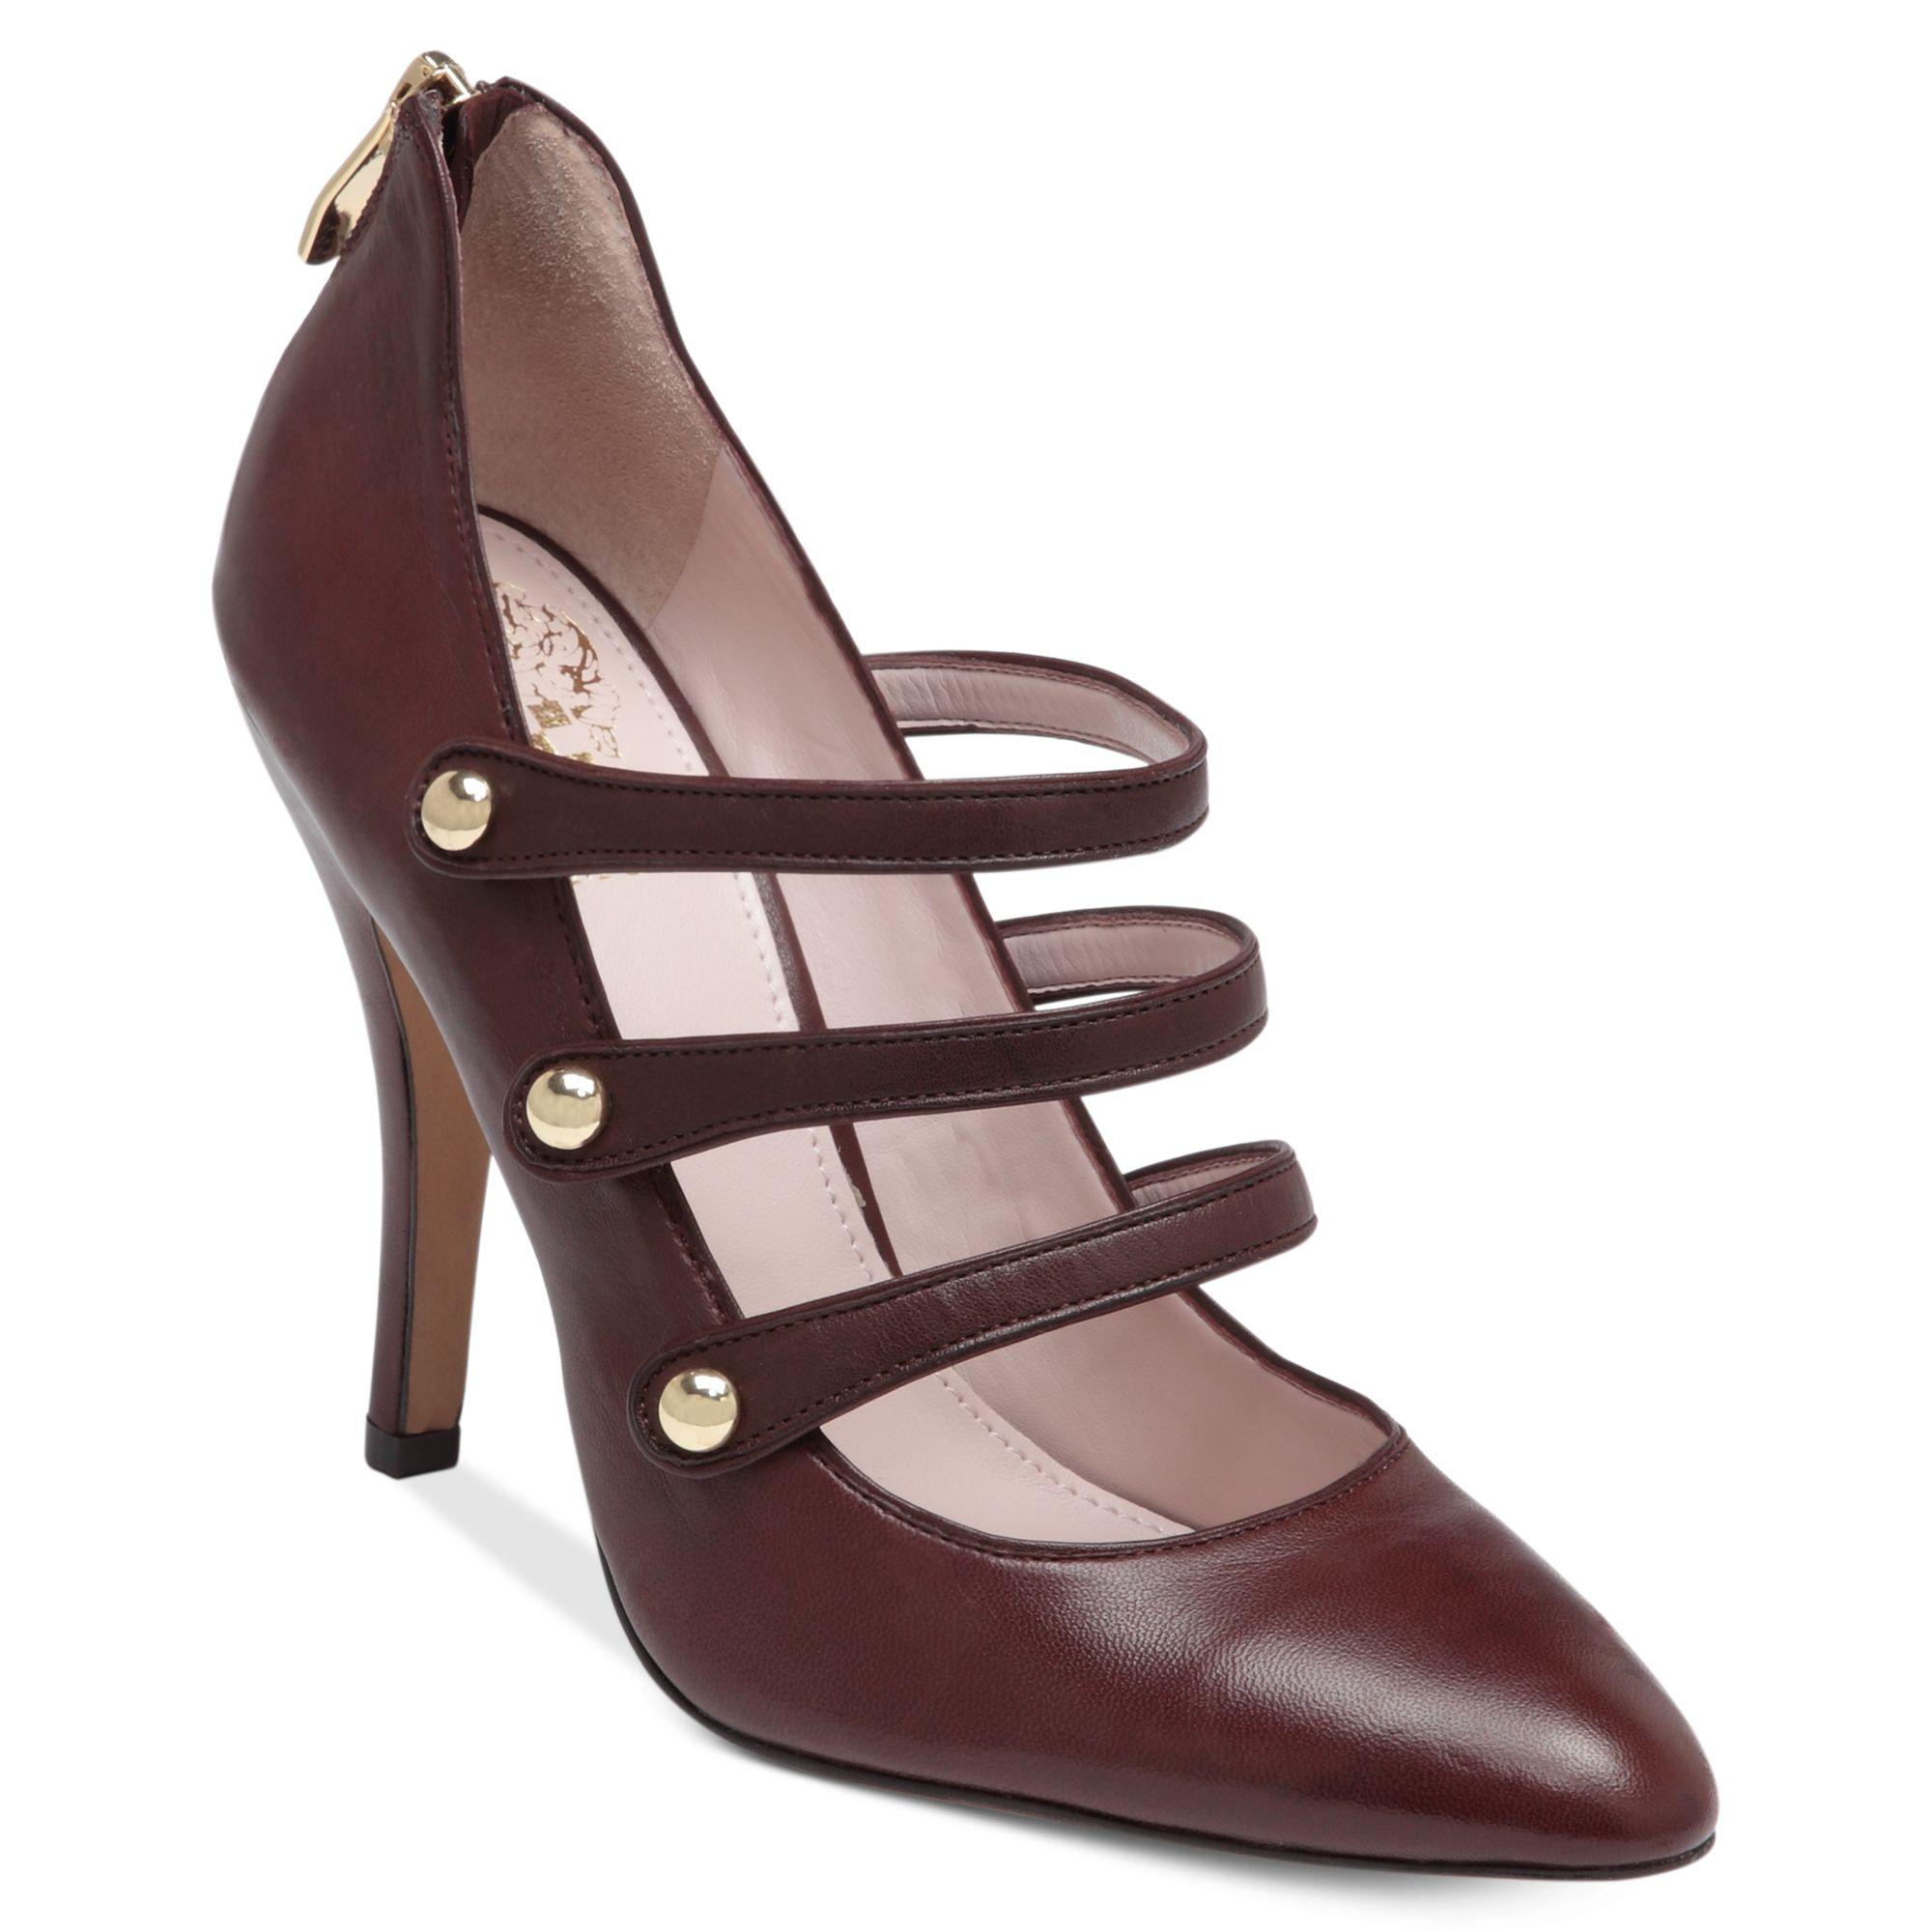 Vince Camuto Vince Camuto Shoes Jamily Triple Gore Pumps